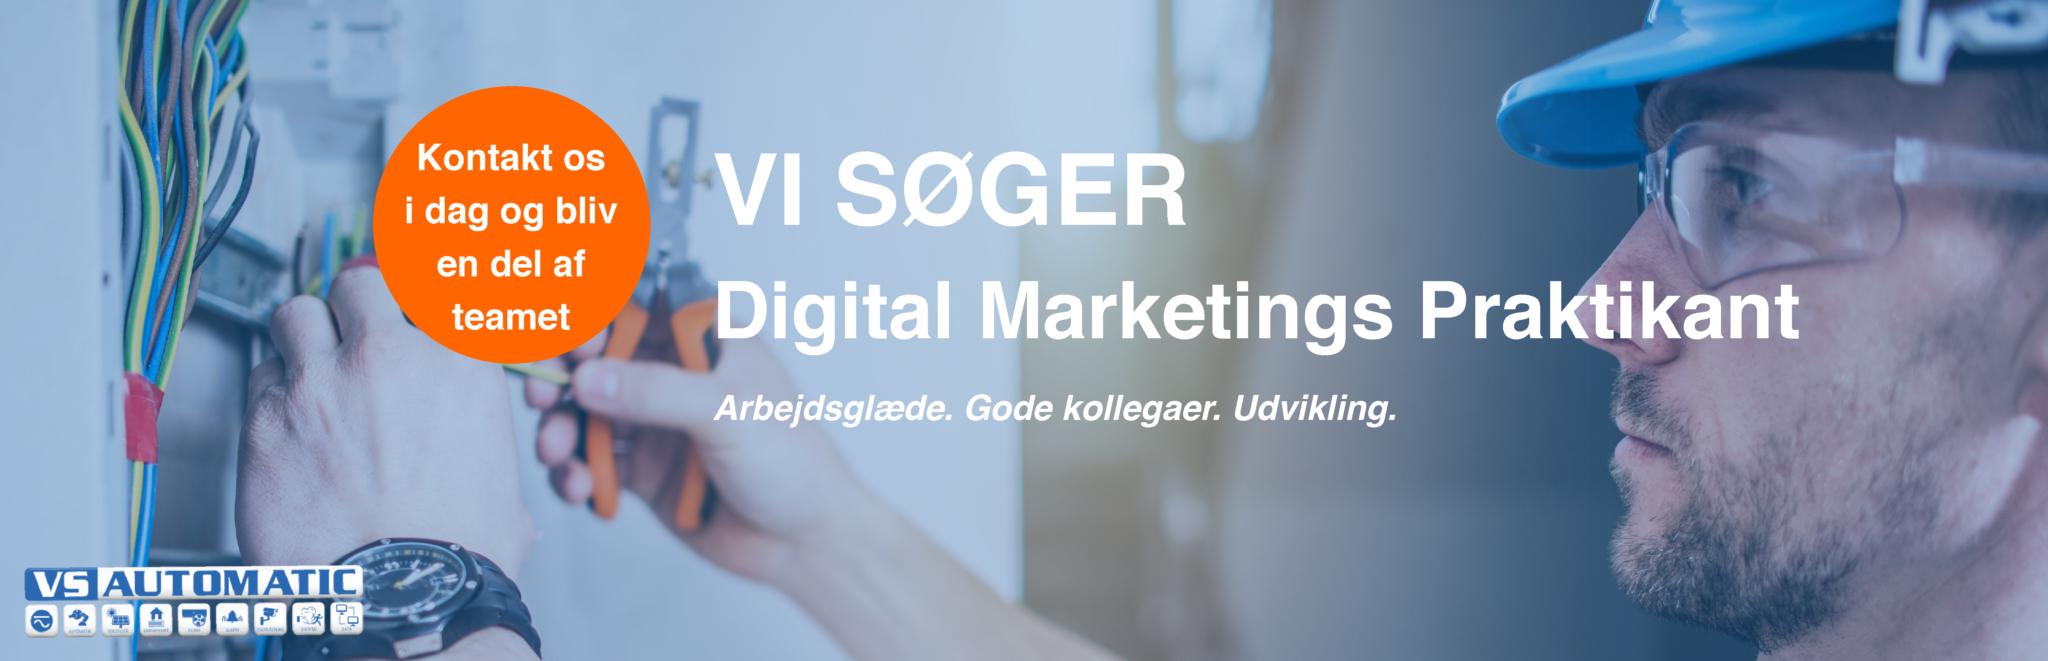 digital marketings praktikant